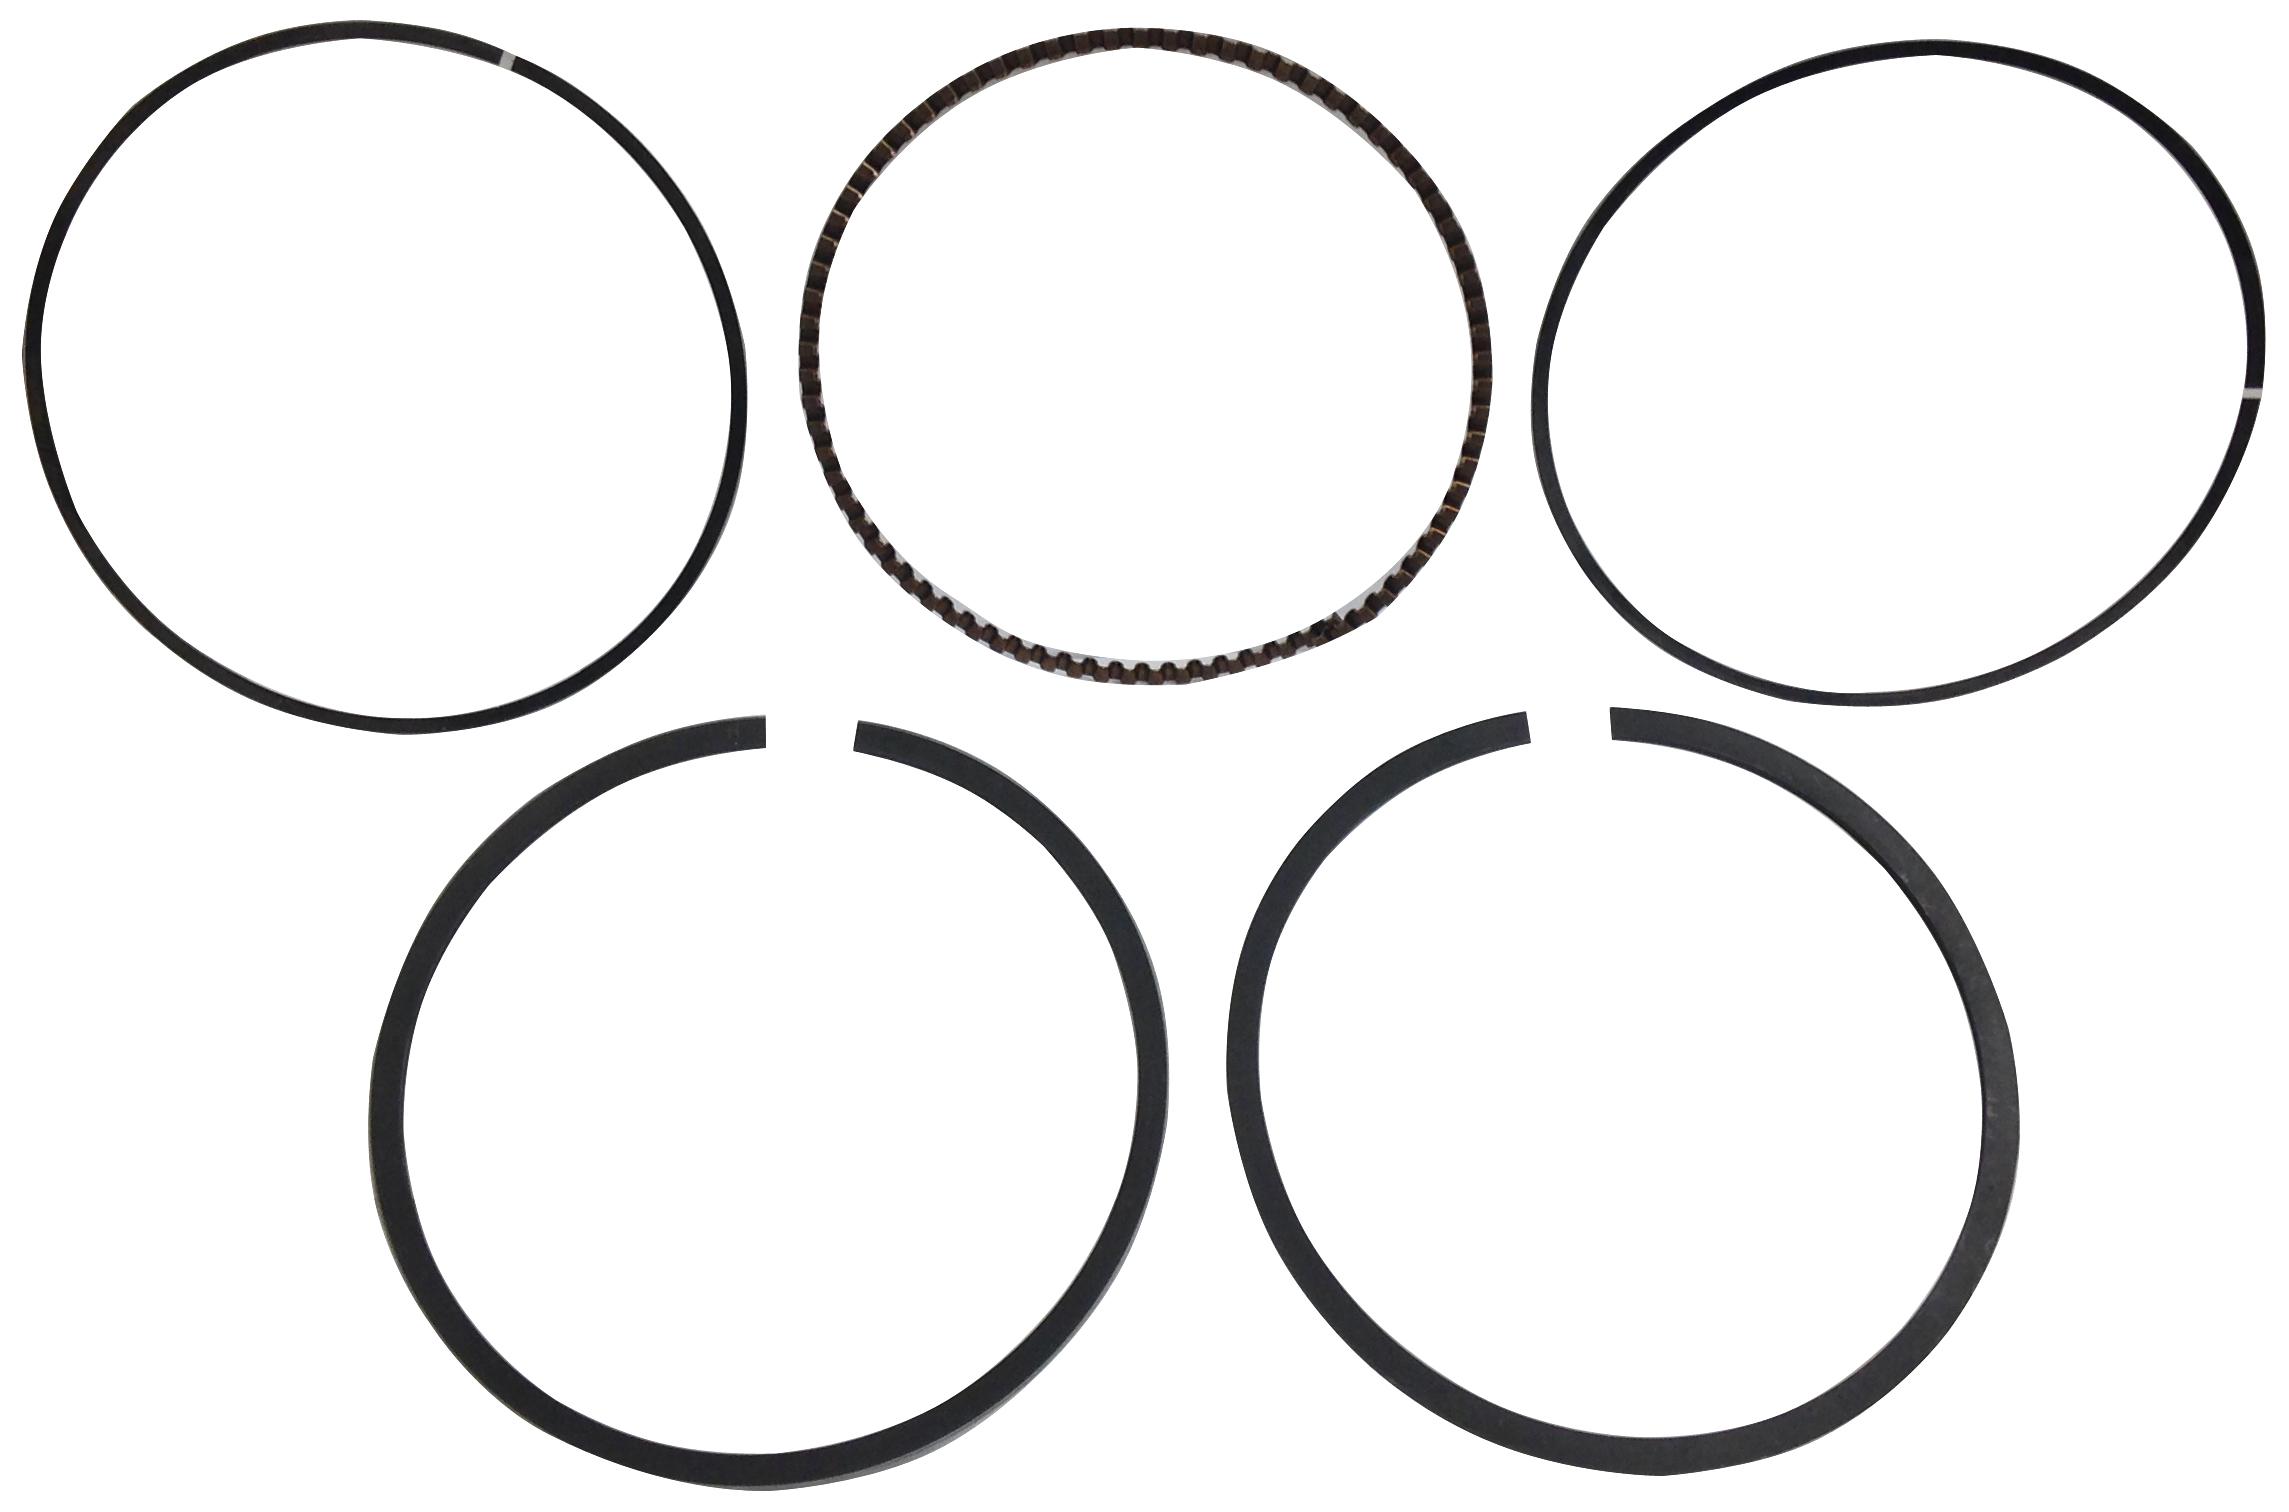 Piston Rings For 13hp Clone Honda Gx390 Engine